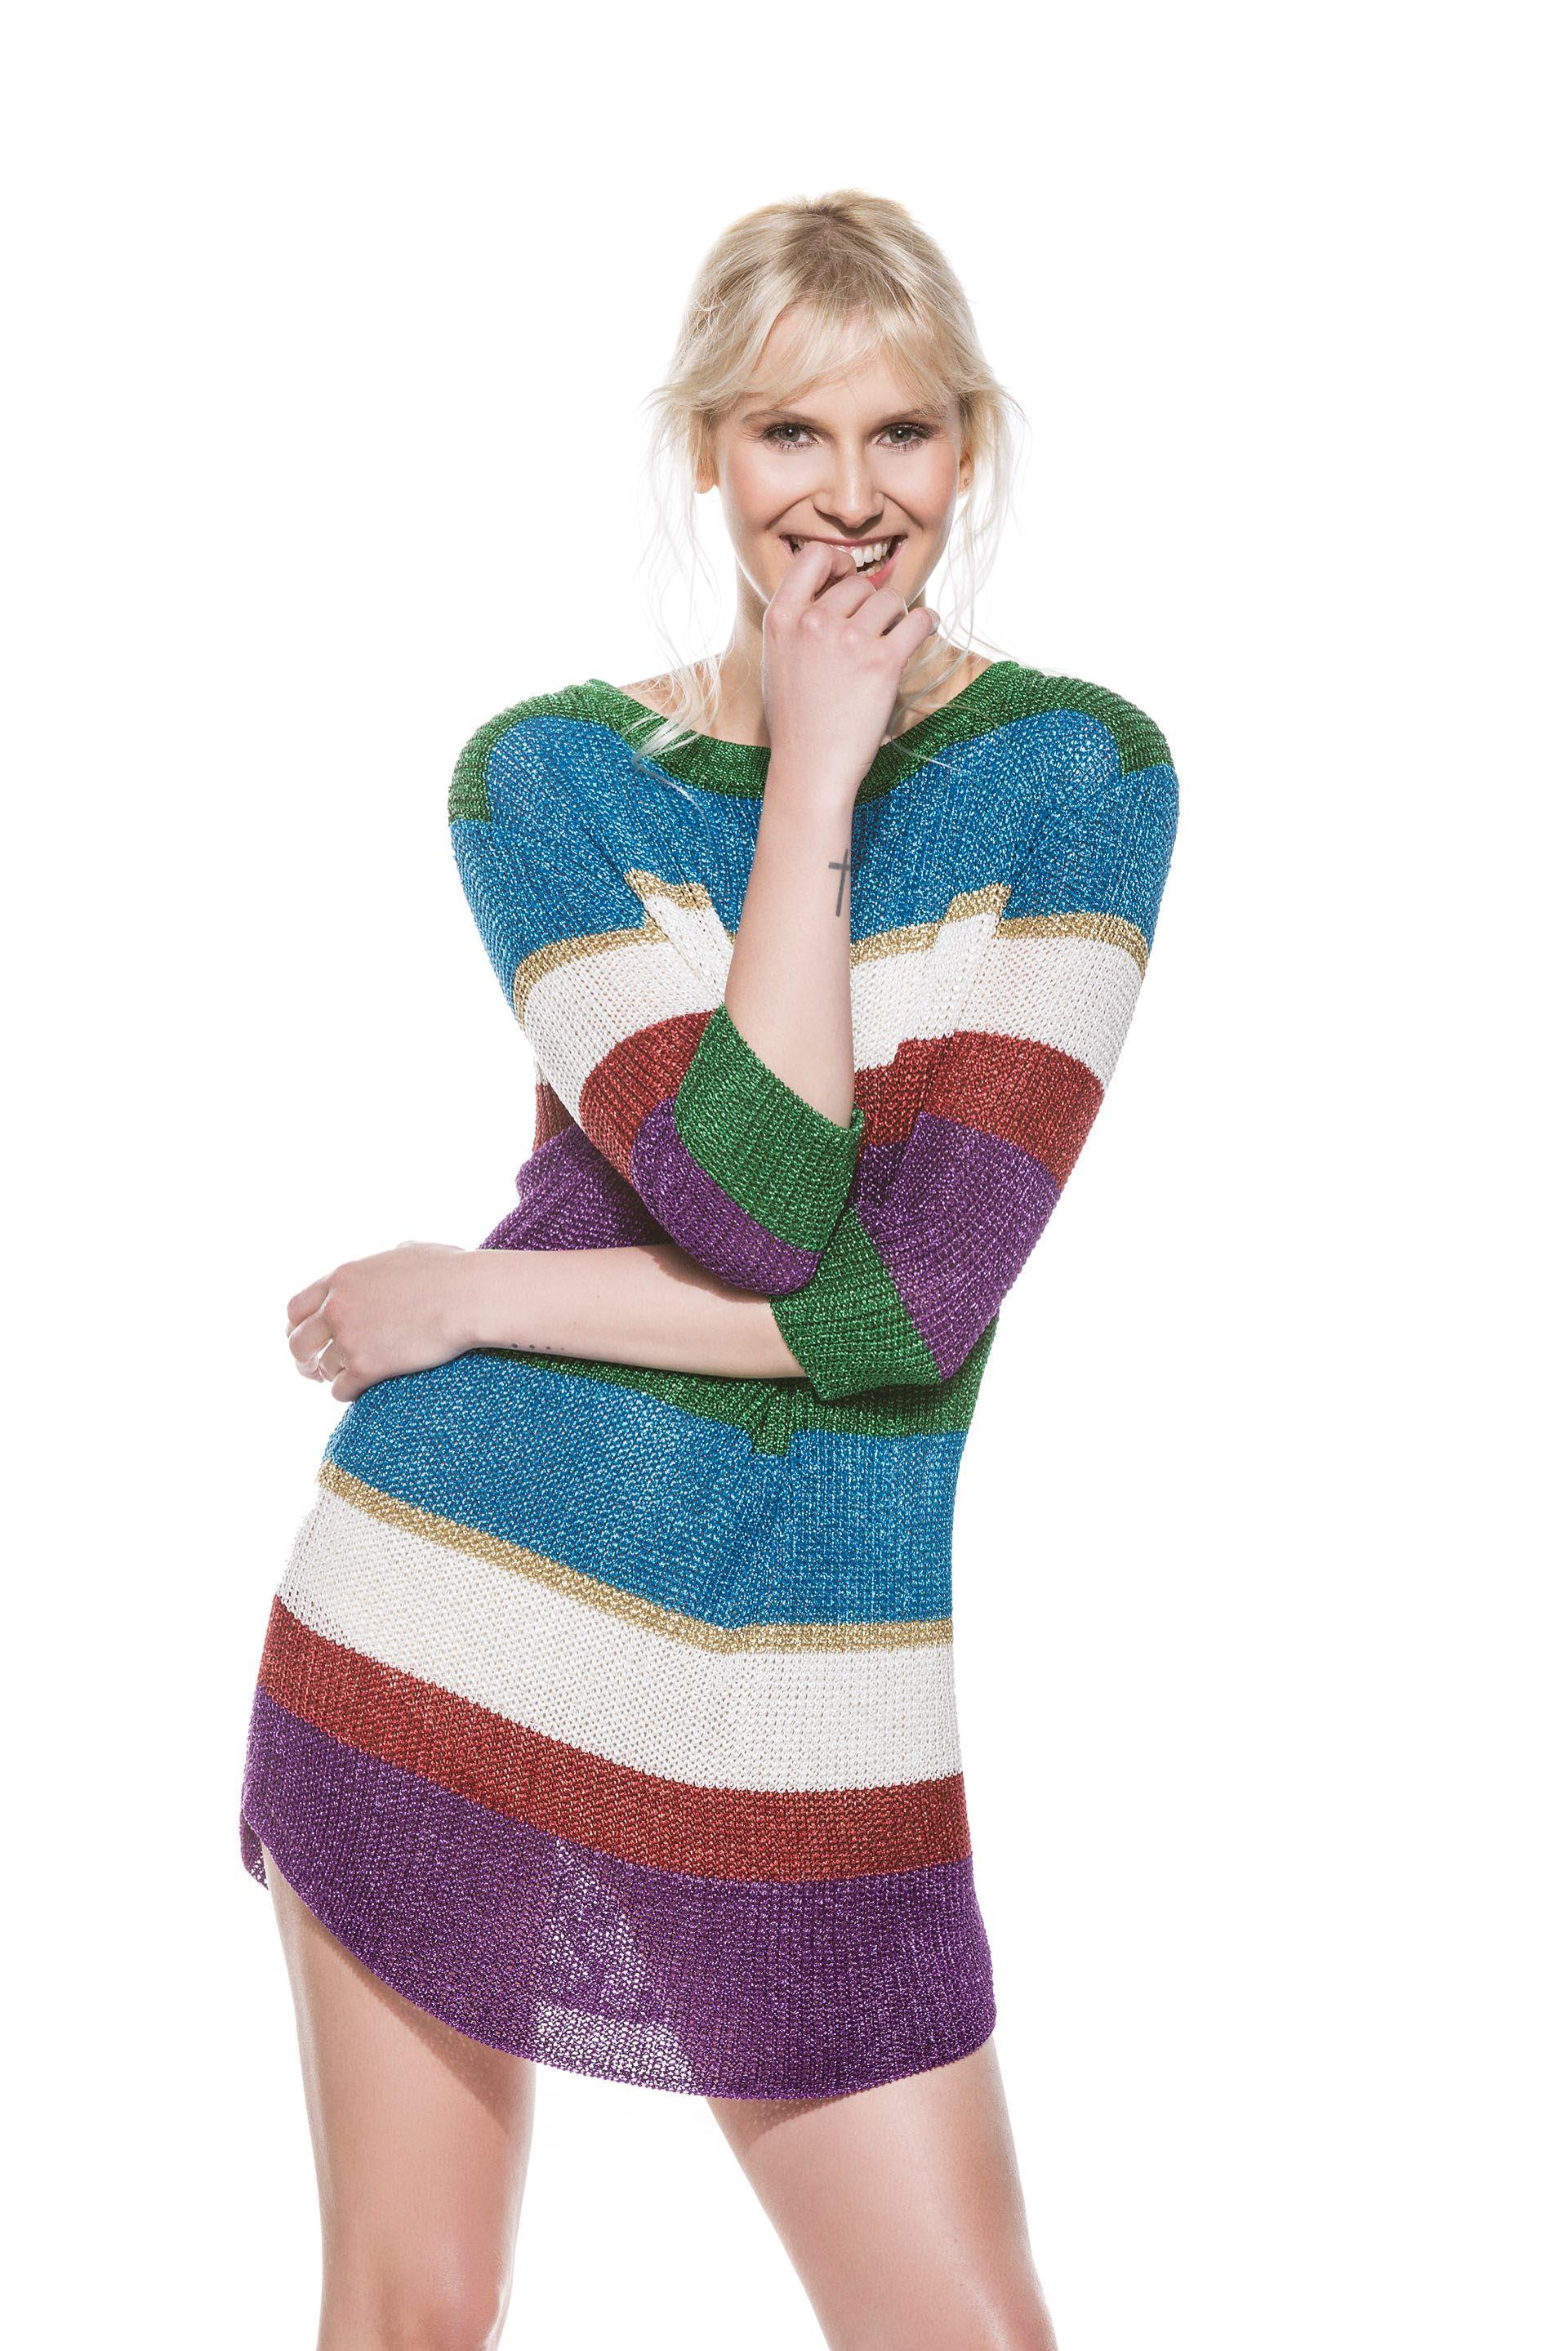 Vestido de lúrex tejido (Cher).